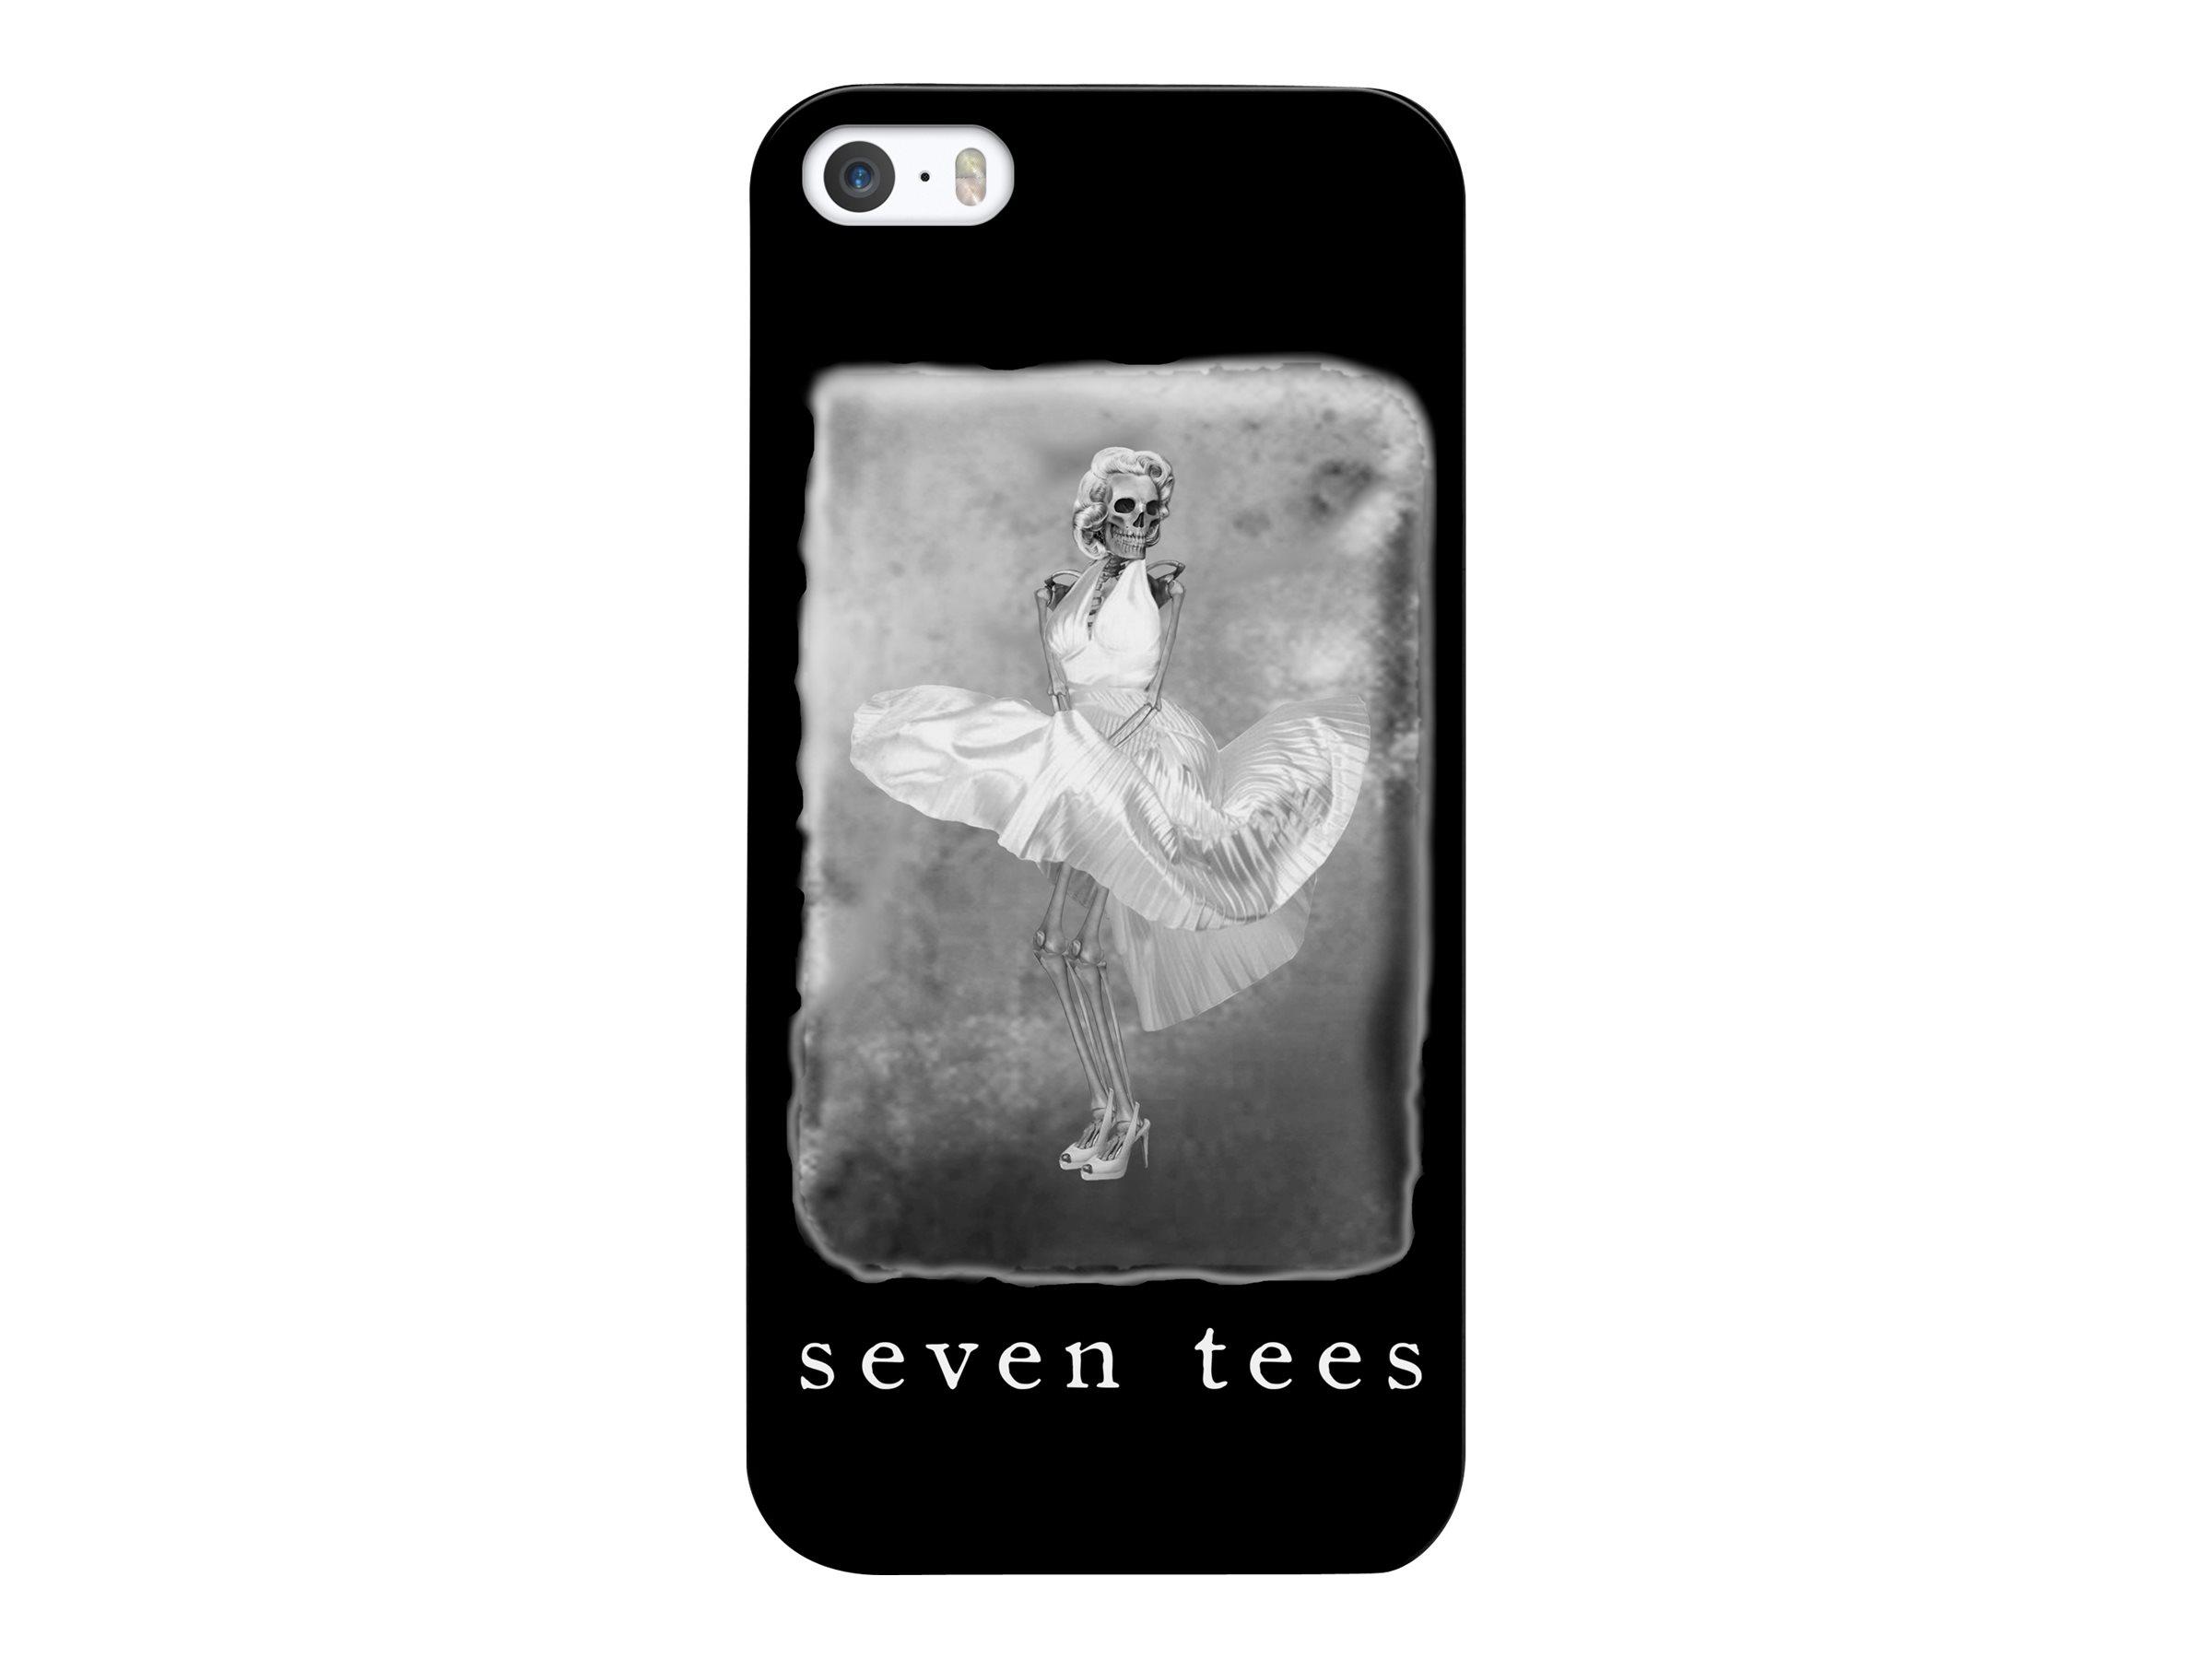 Seventees Marylin Monroe coque de protection pour téléphone portable